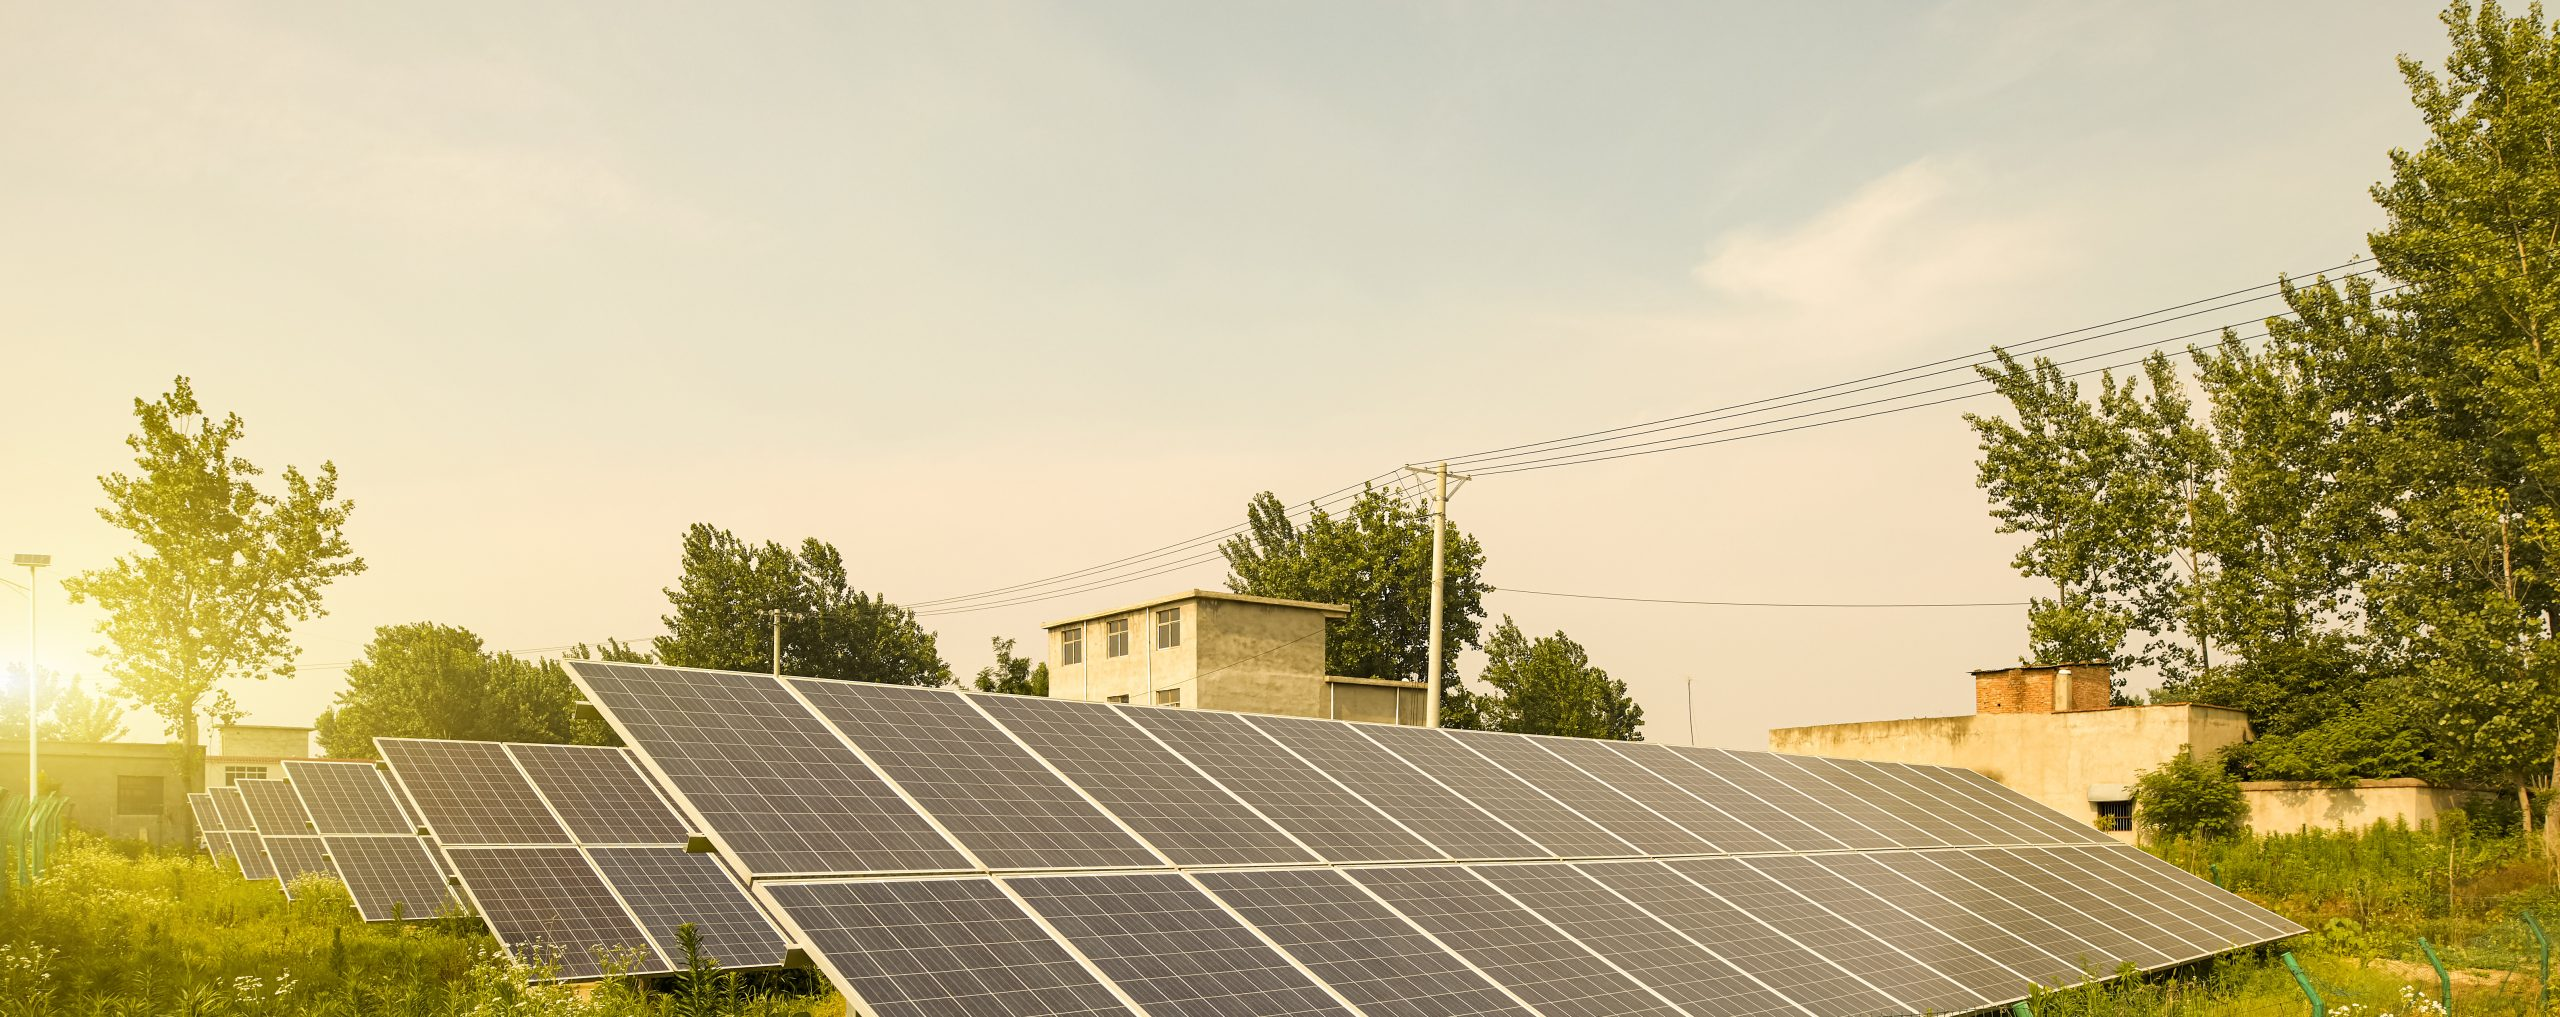 new alpha solar community